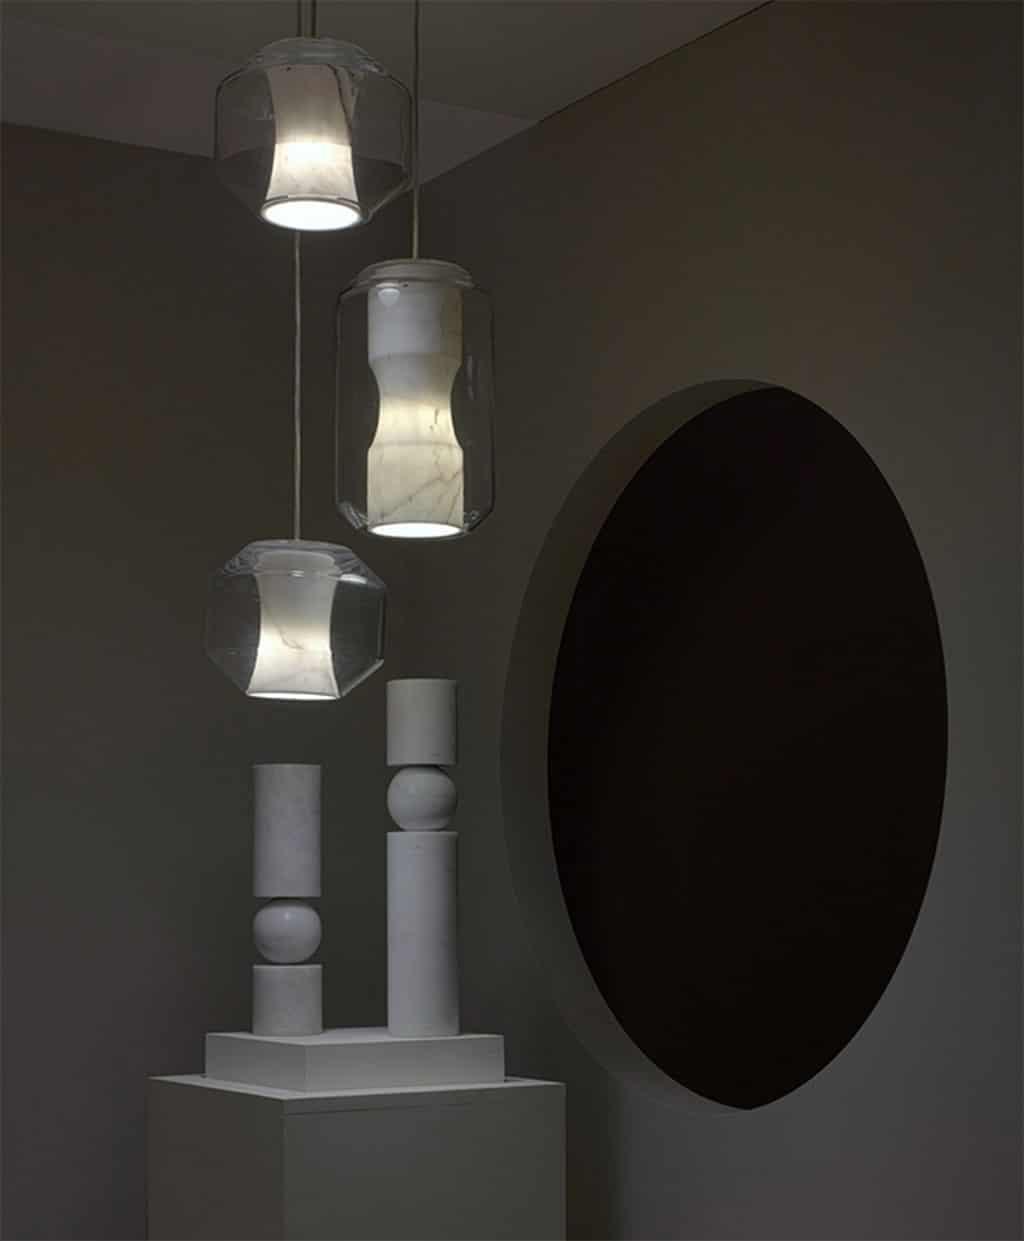 LEE BROOM - CHAMBER LIGHT